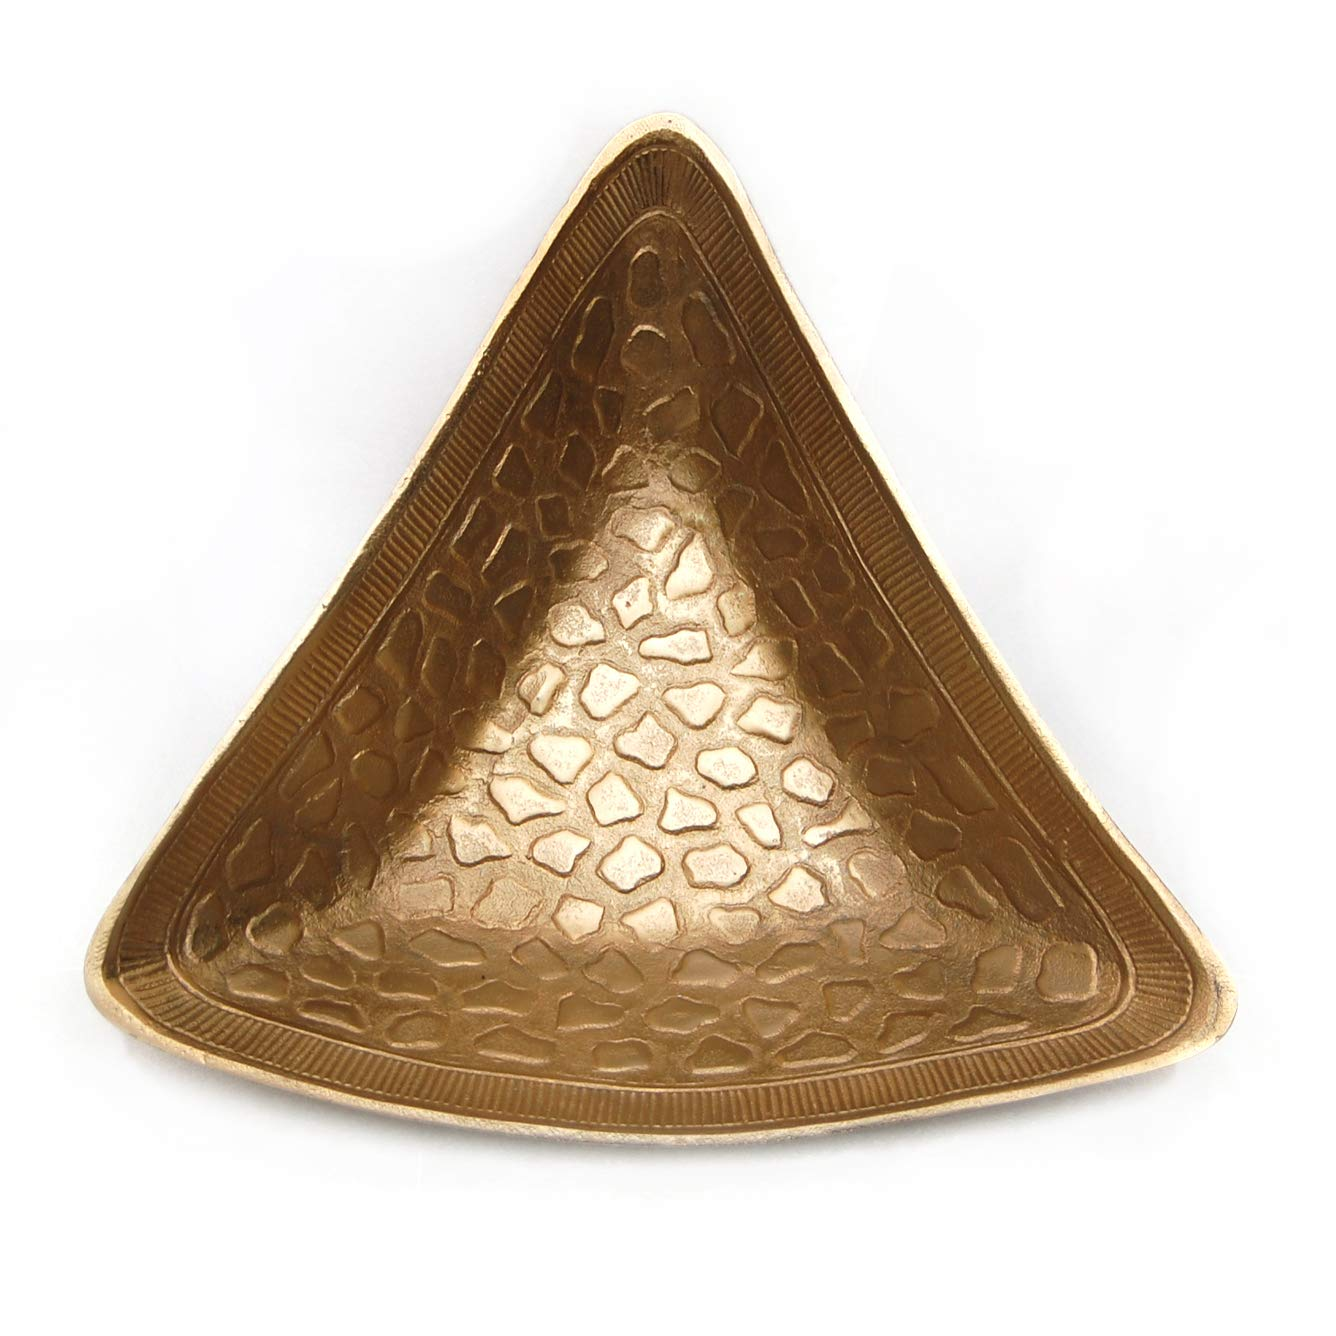 Motif - Gold Serving Tray